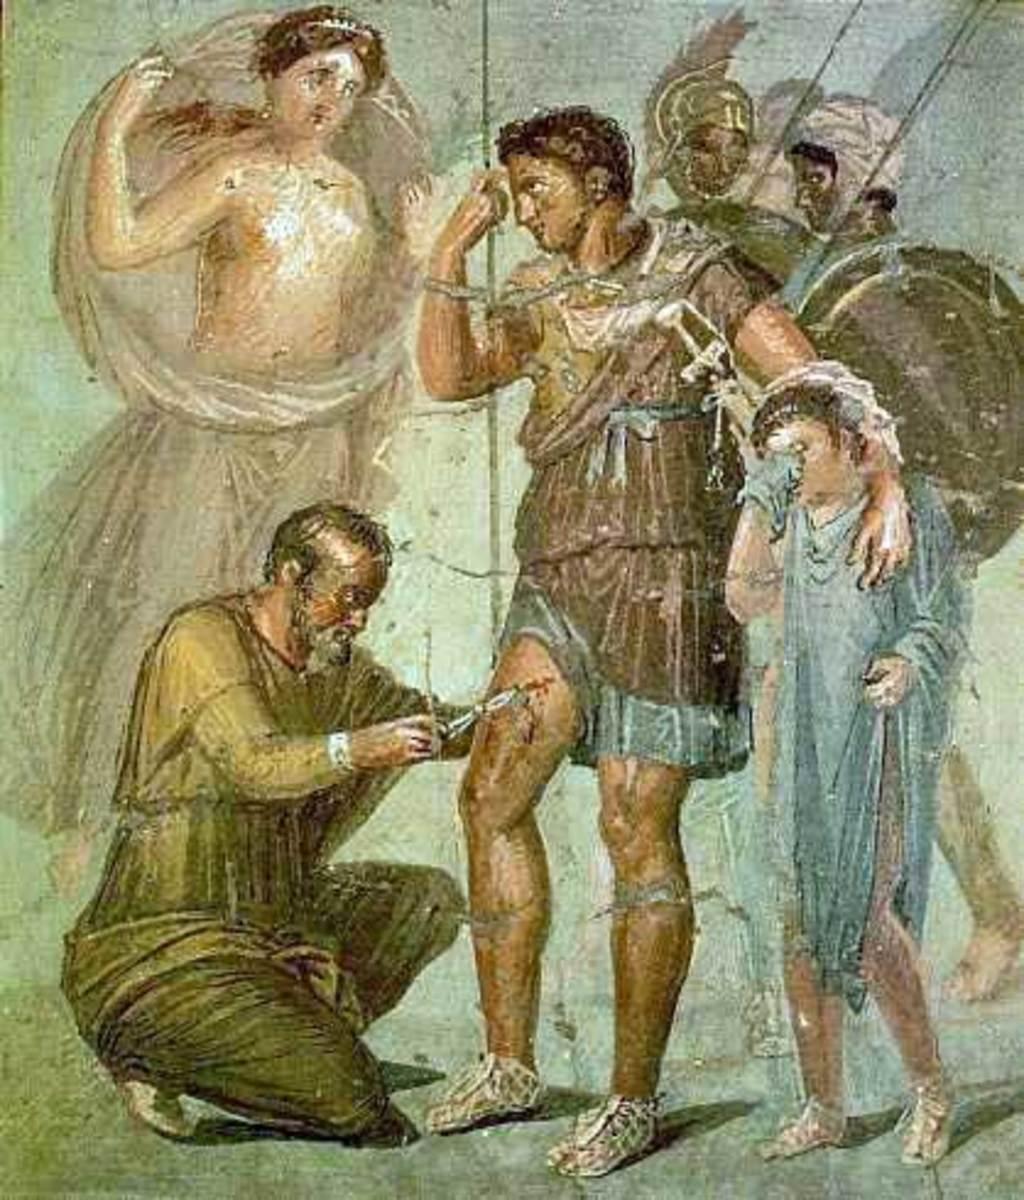 The Aeneid by Virgil: Aeneas Meeting Daedalus